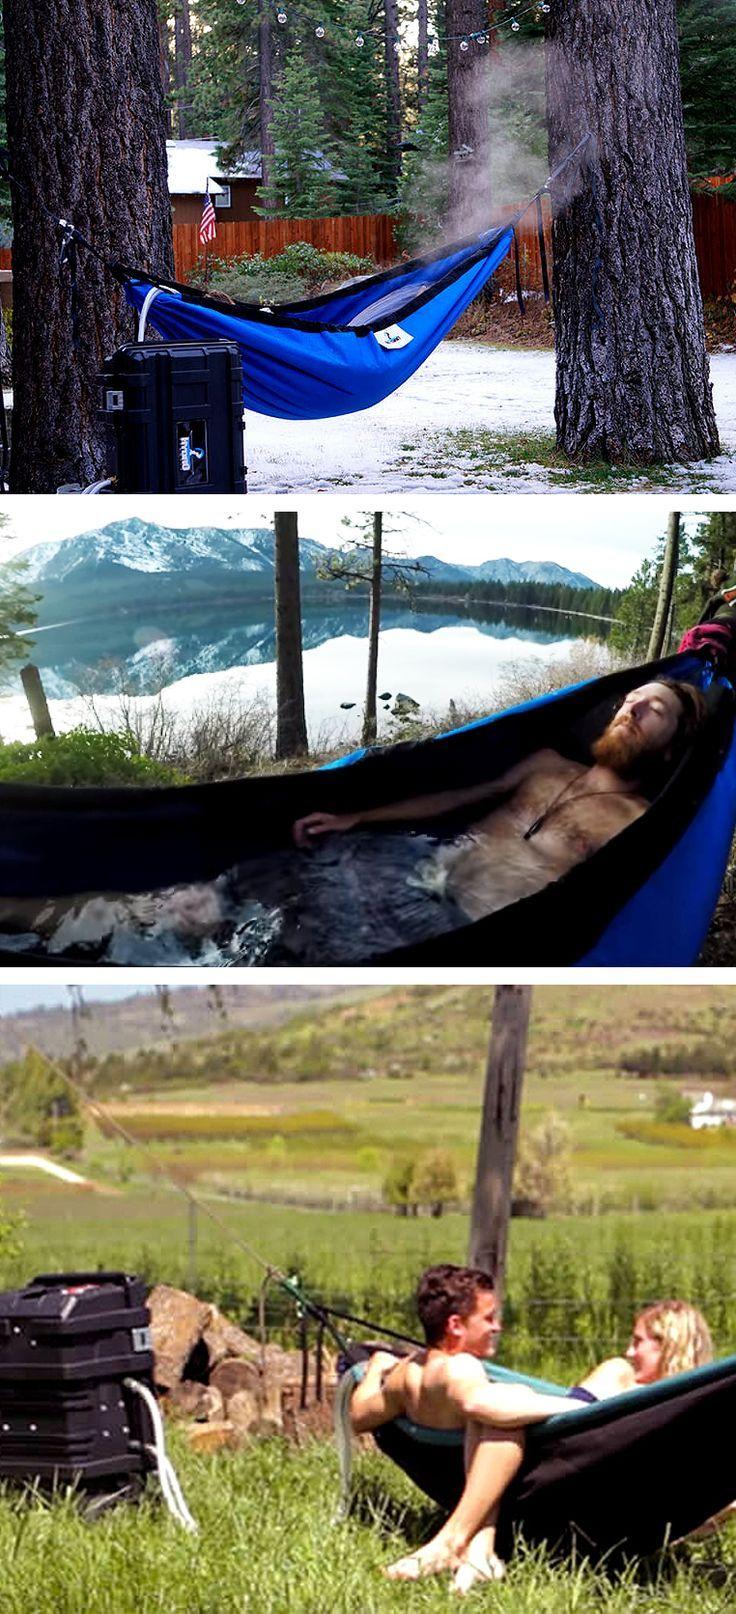 Hot Tub Hammock Couple Trend